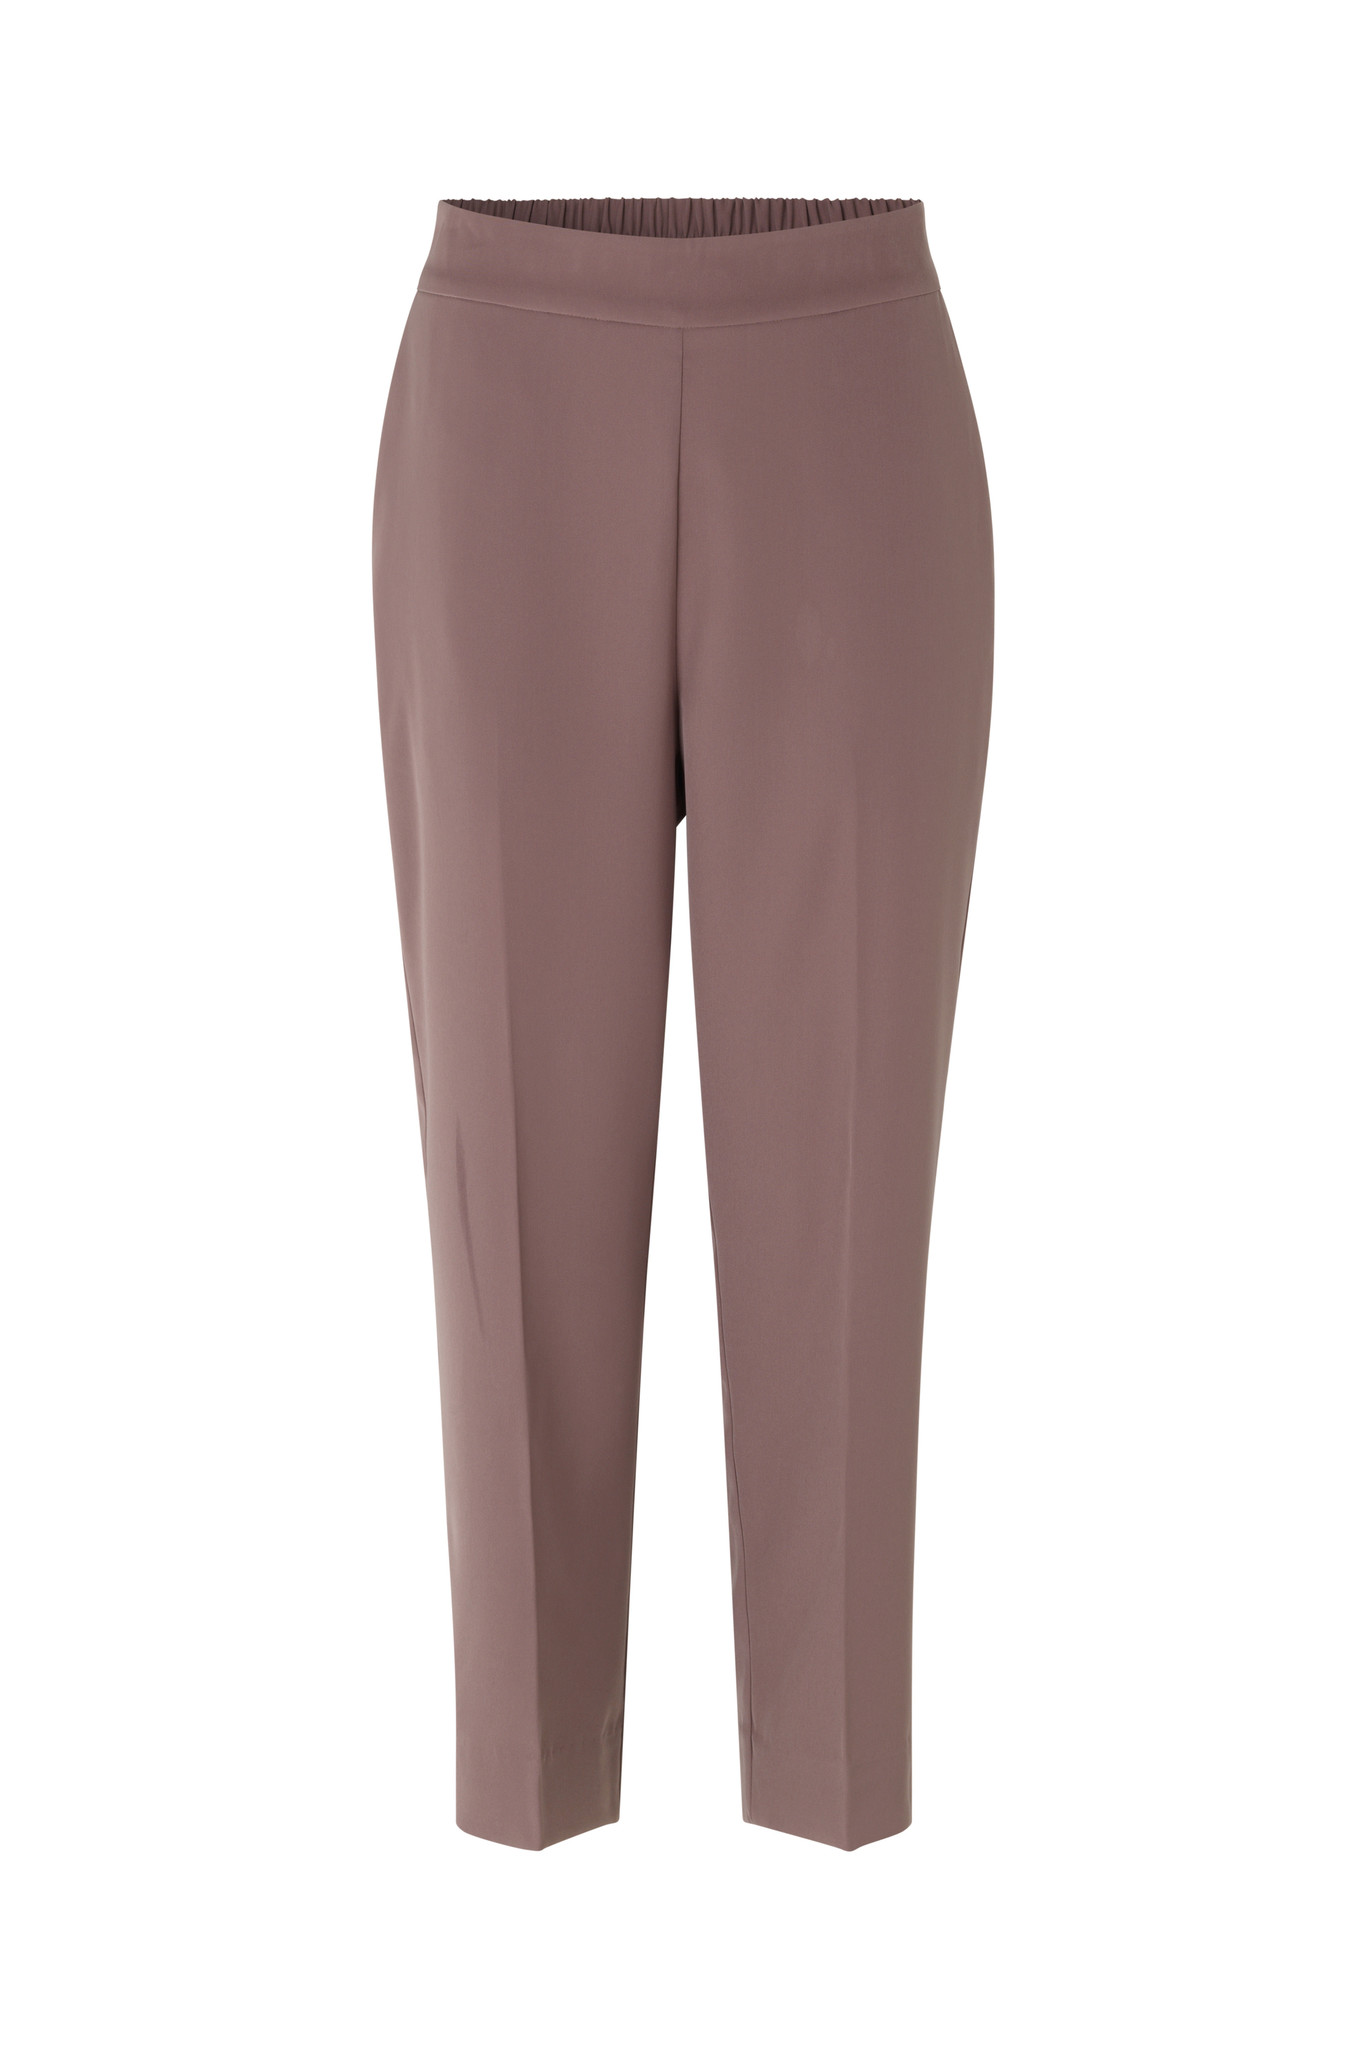 Garbo Trousers - Peppercorn-1